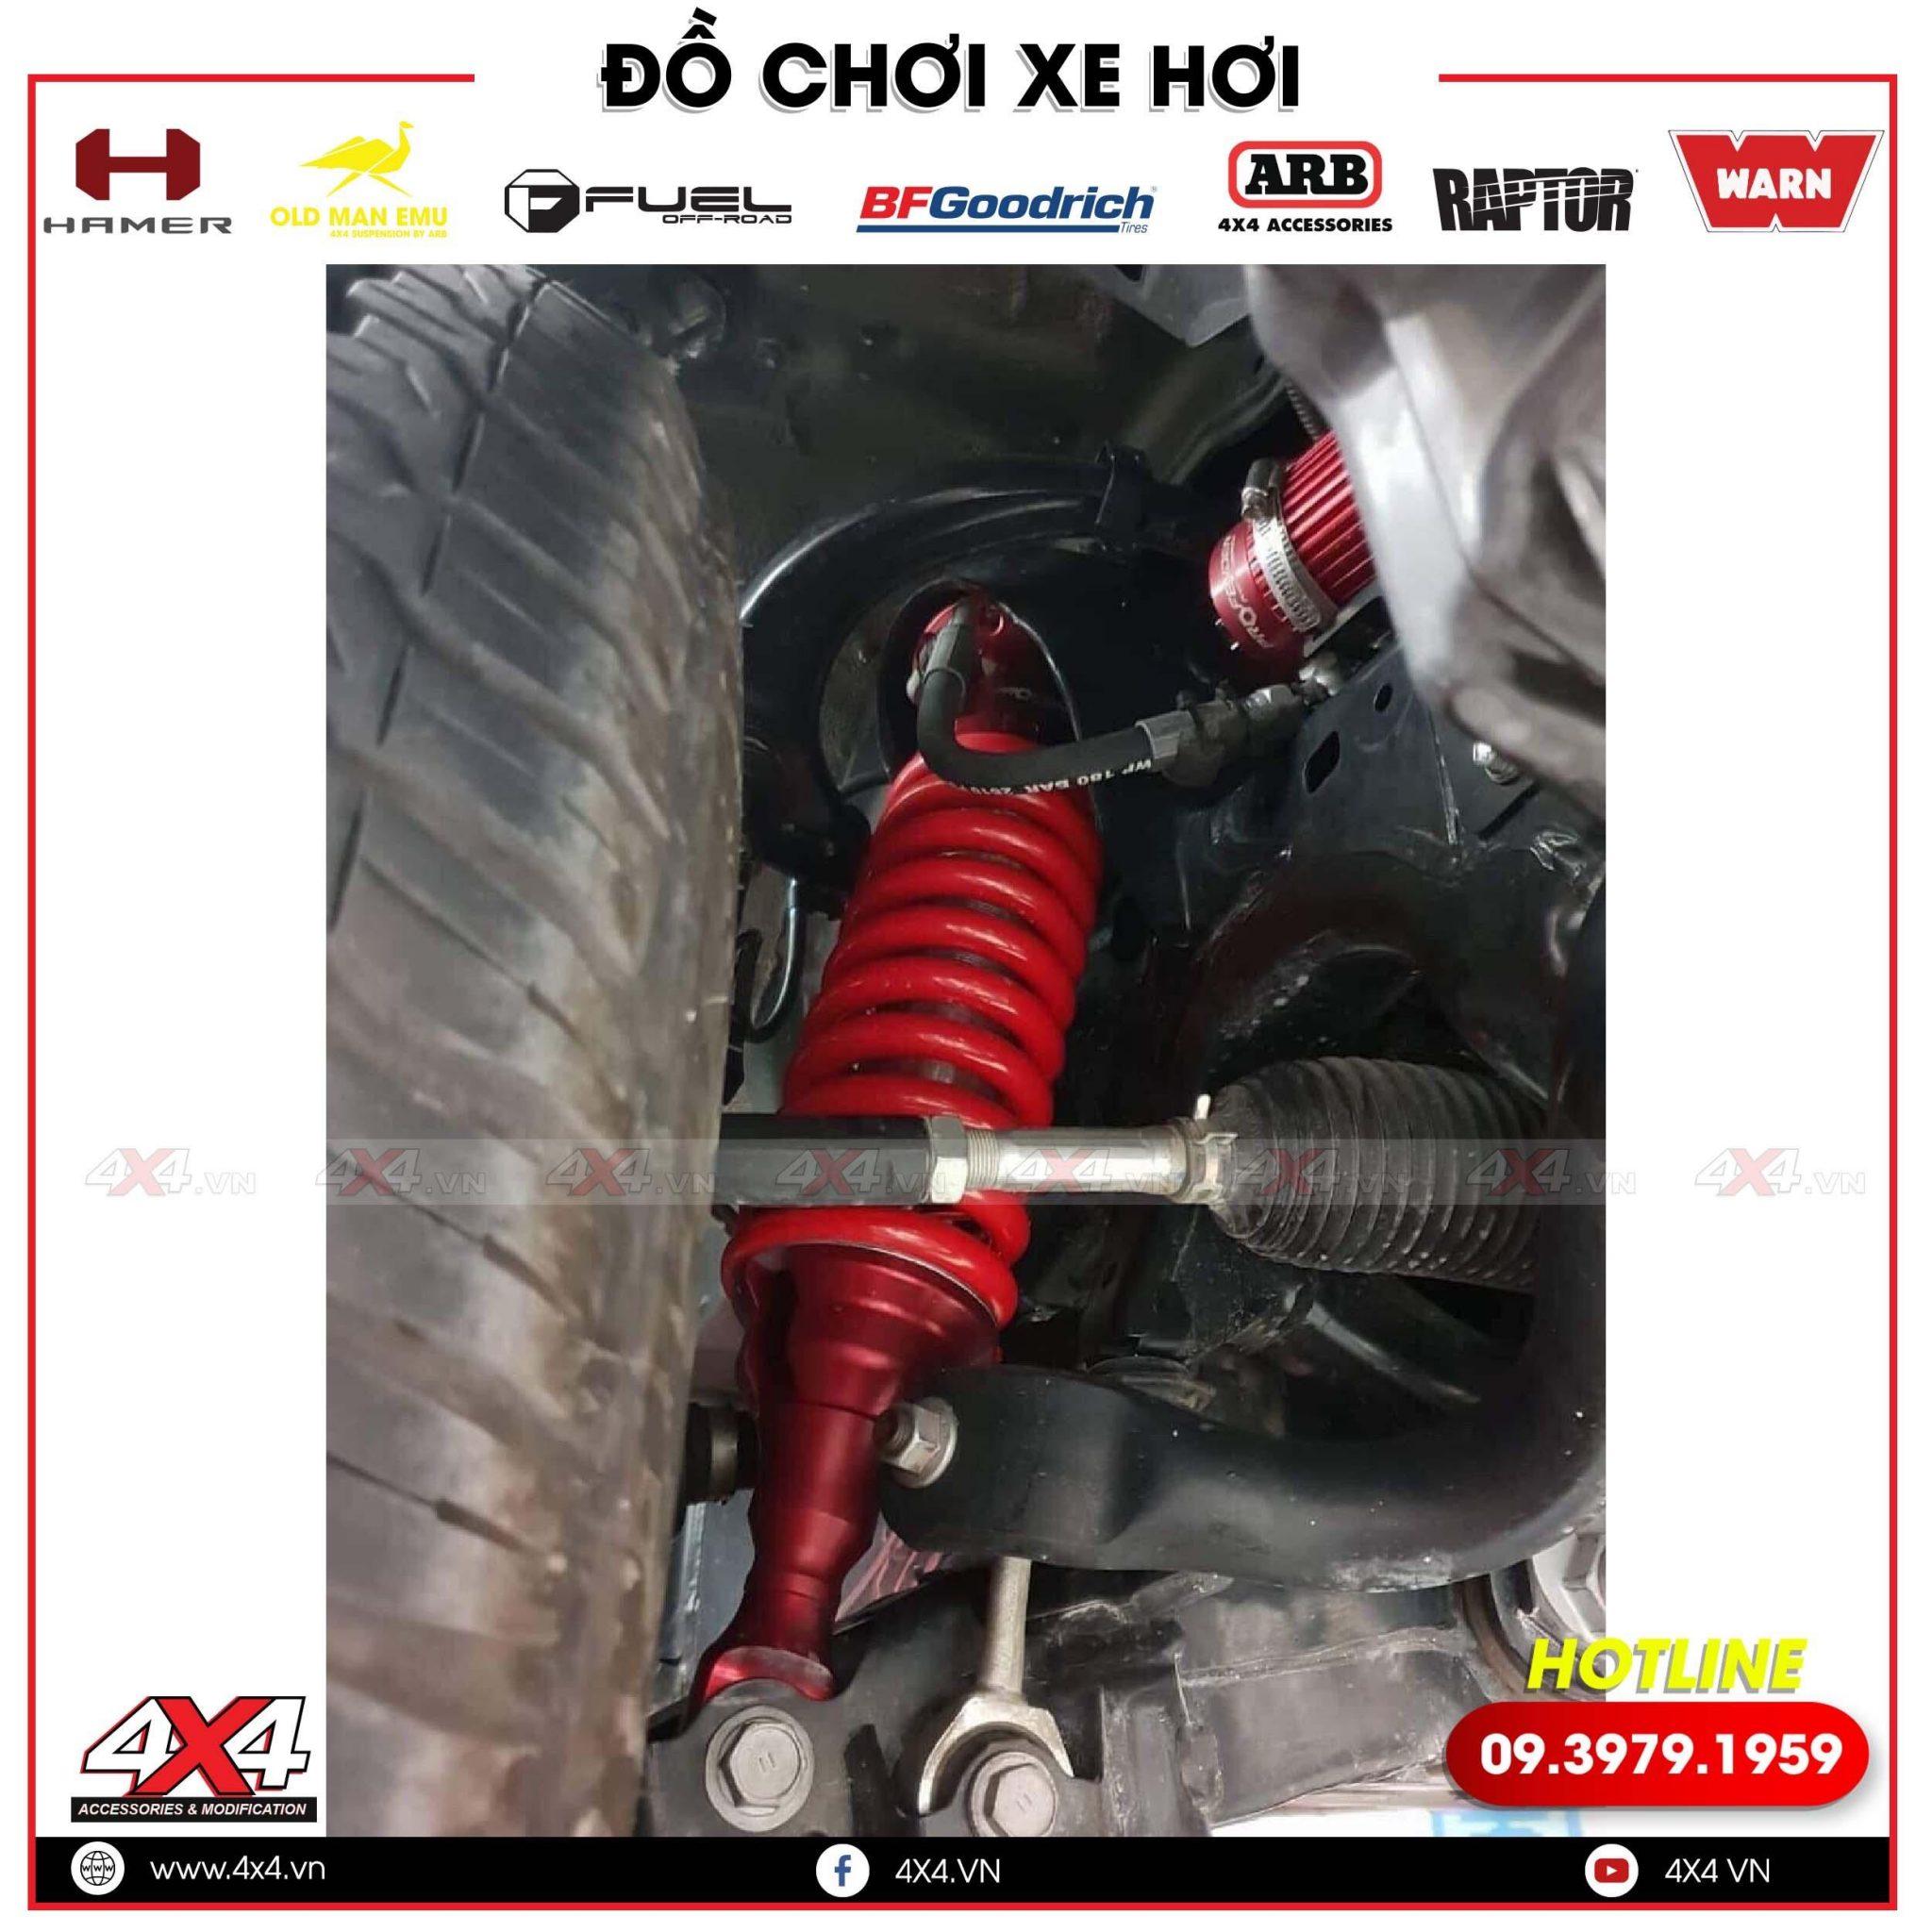 Phuộc Profender Mazda BT50 Giá Ra Sao tại Garage 4x4